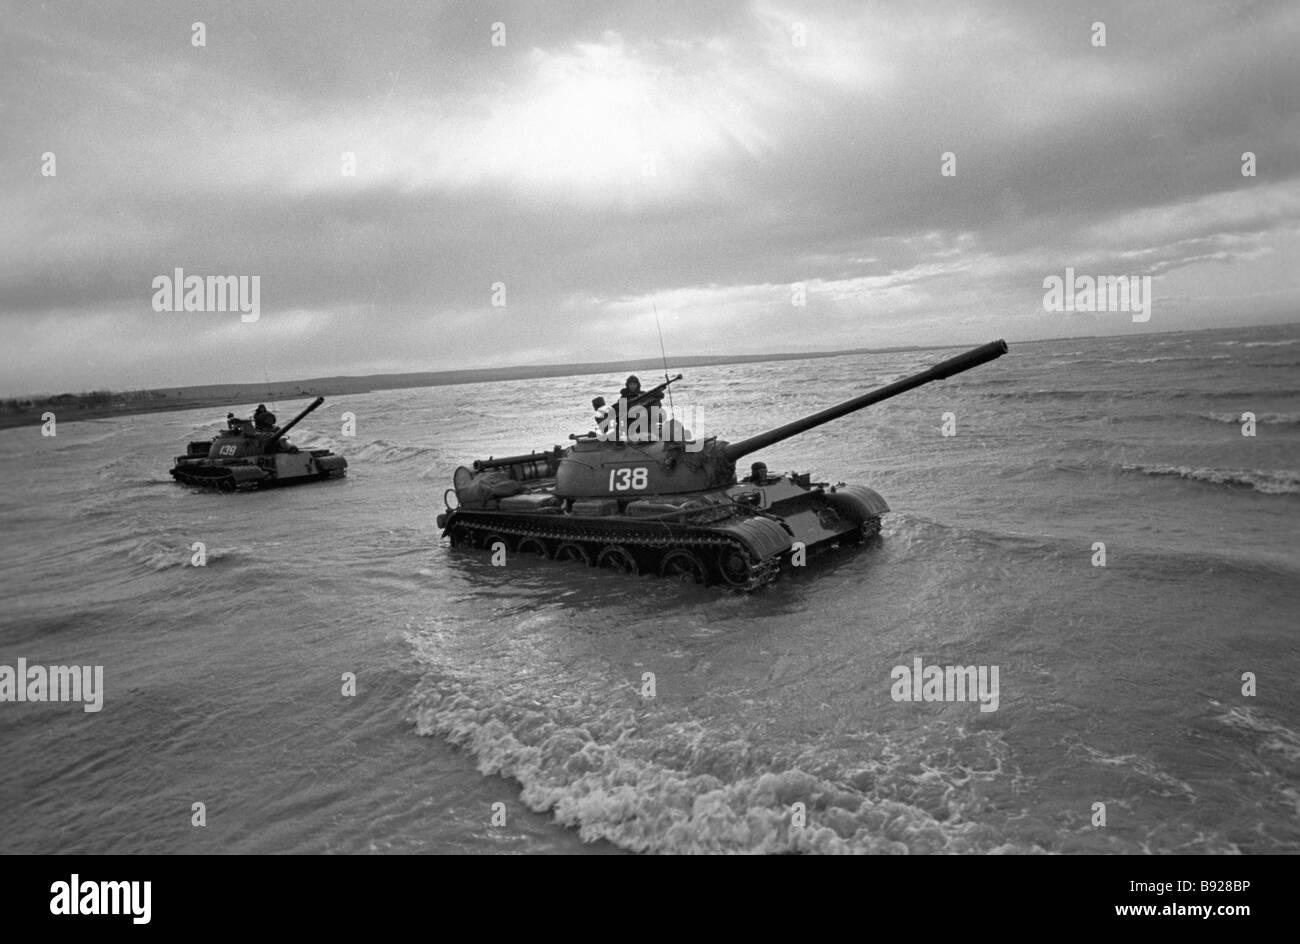 Tanks on the oceanic coast - Stock Image